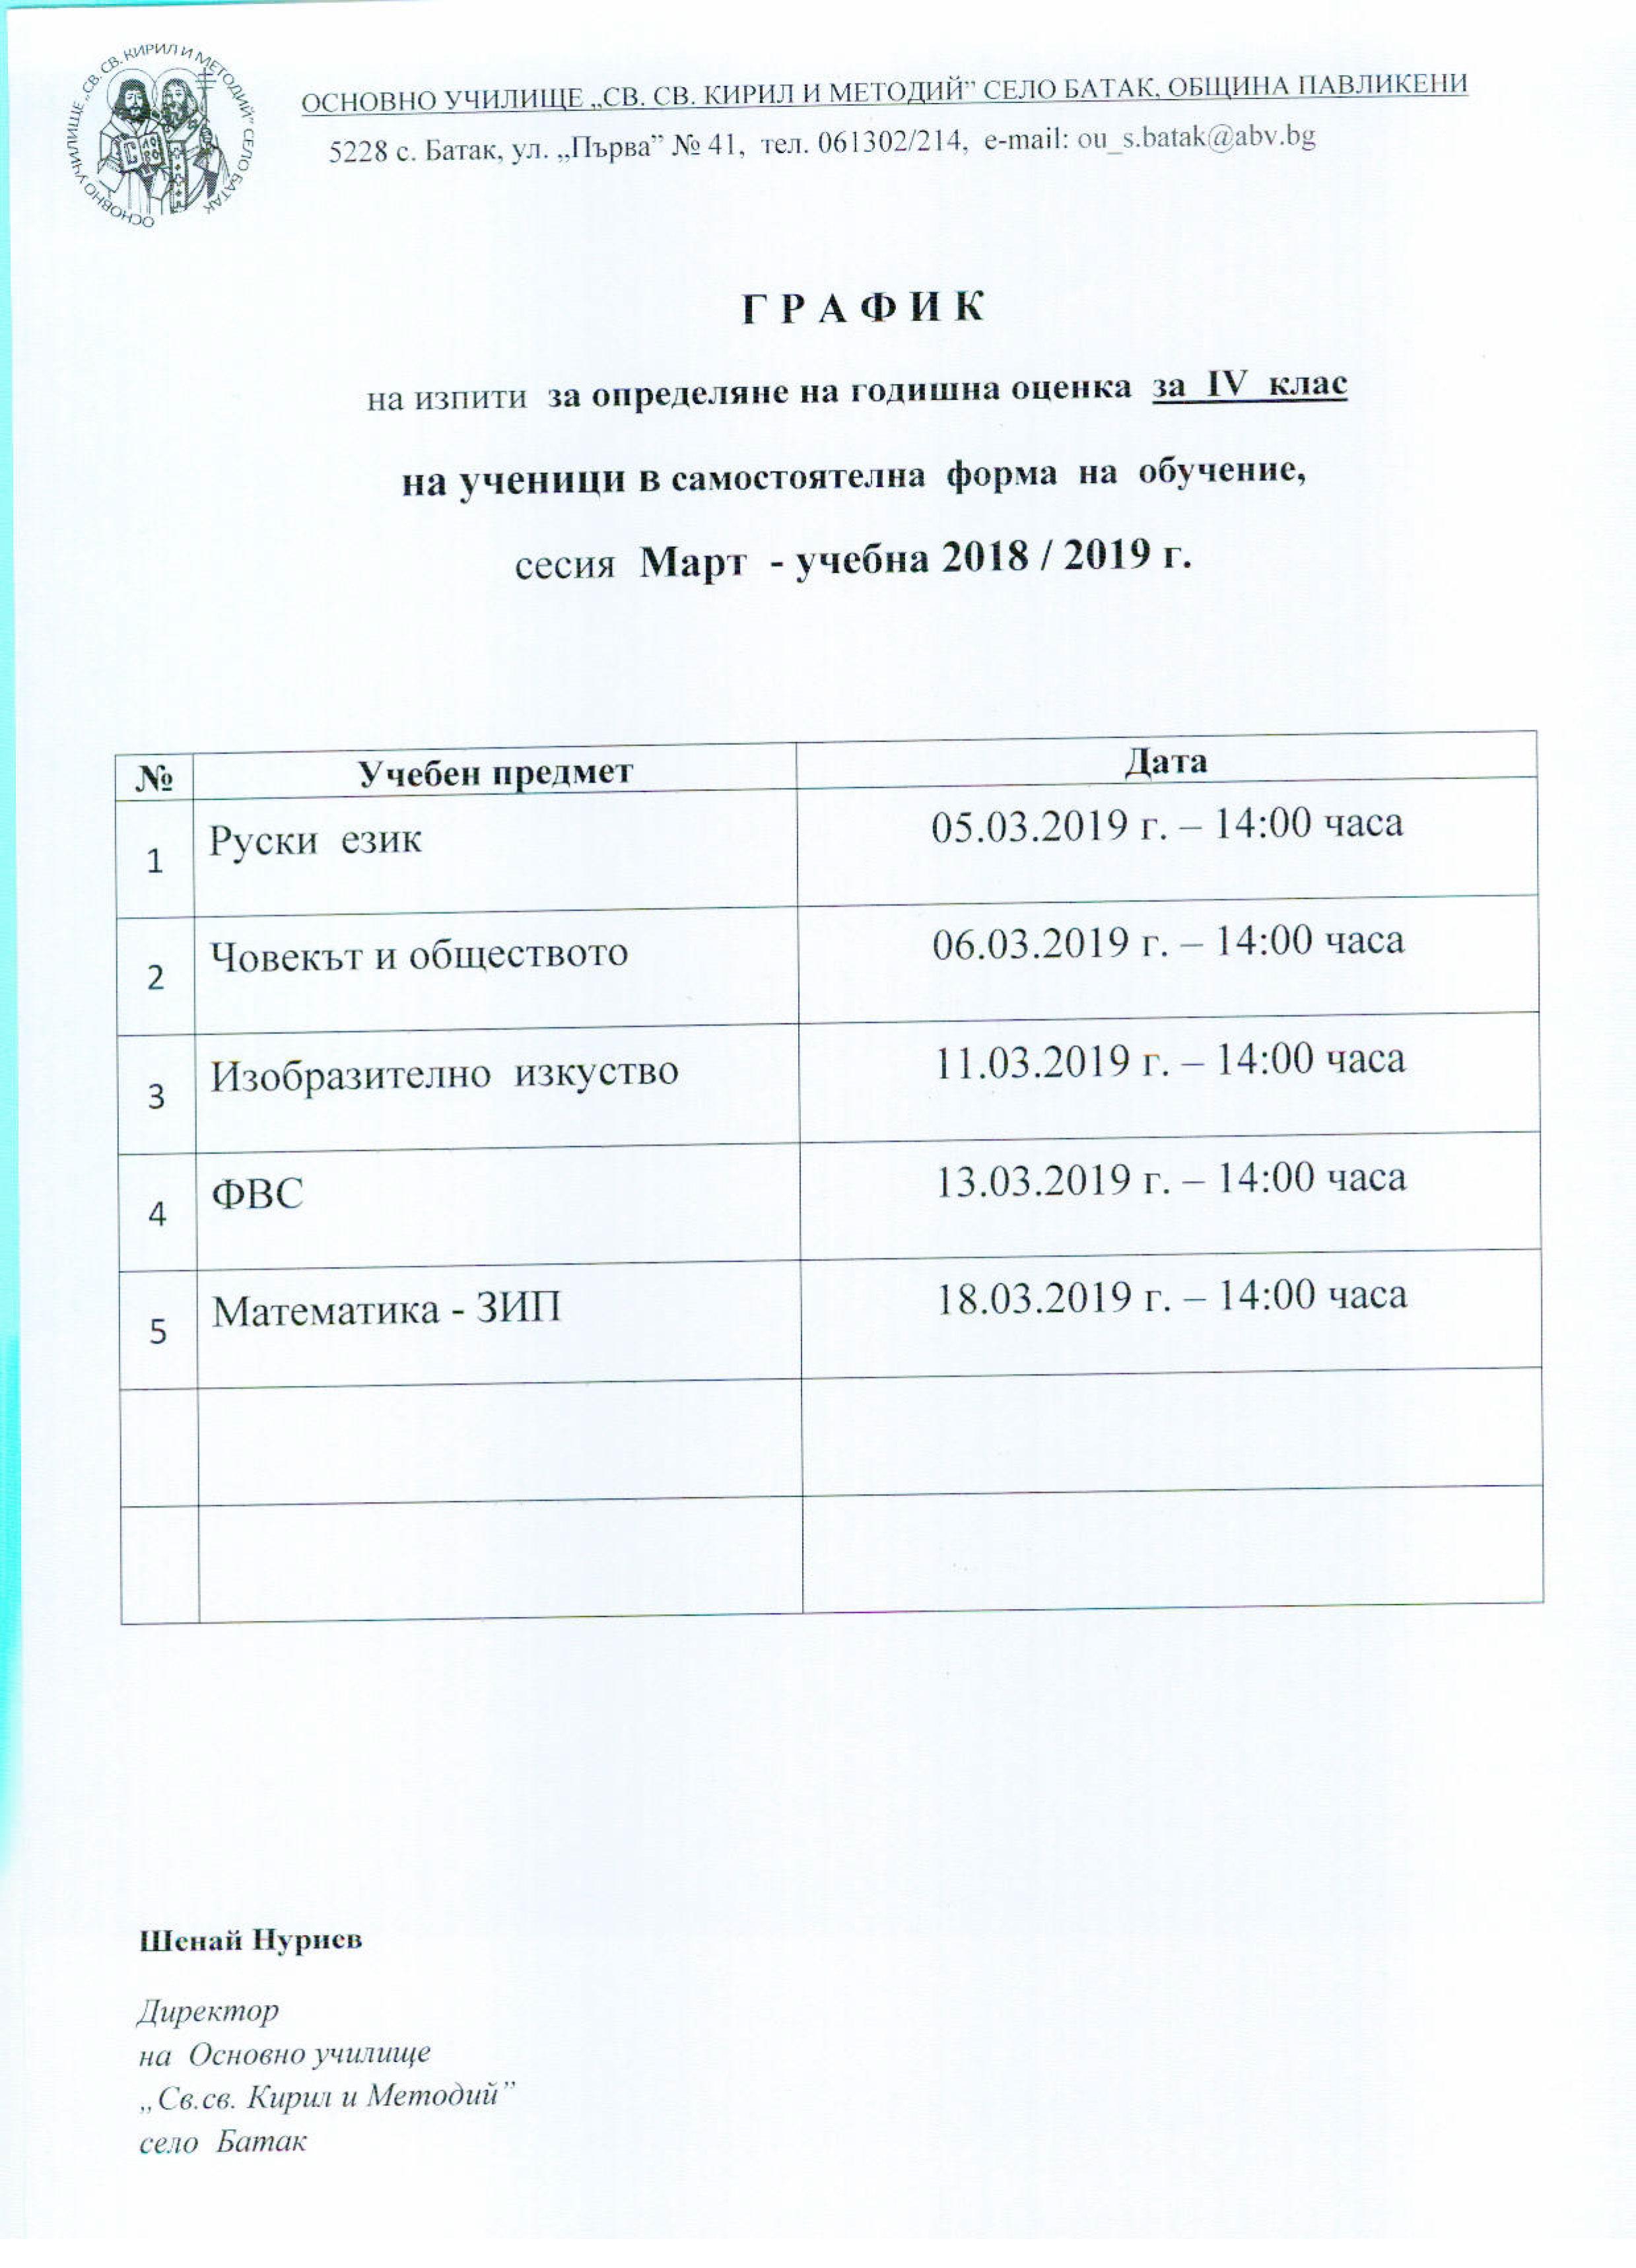 612-График-изпити-СФО-сесия-Март-18-19-Батак-1